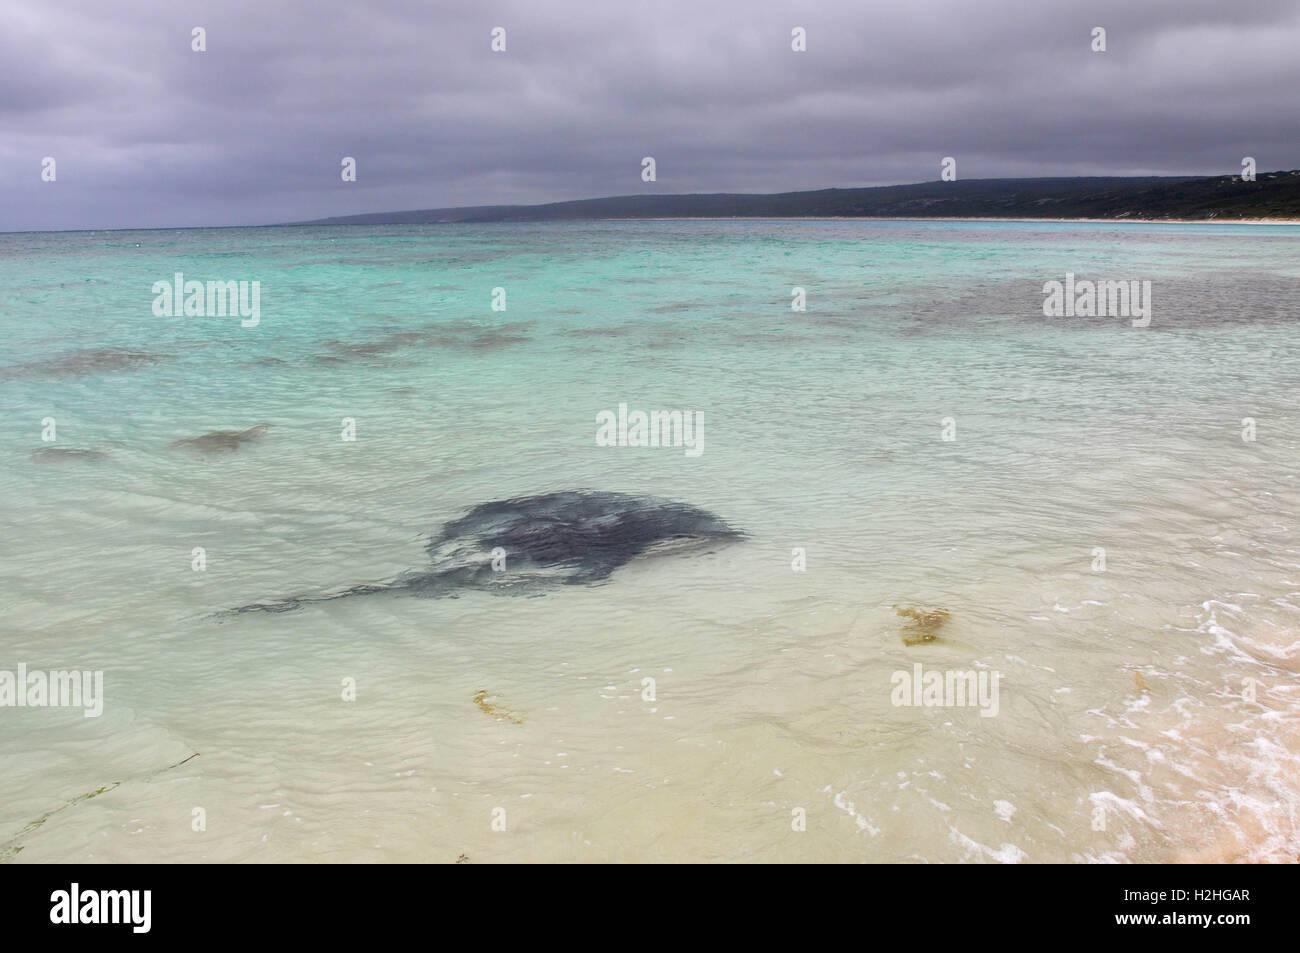 Stingray Hamelin Bay Stockfotos & Stingray Hamelin Bay Bilder - Alamy